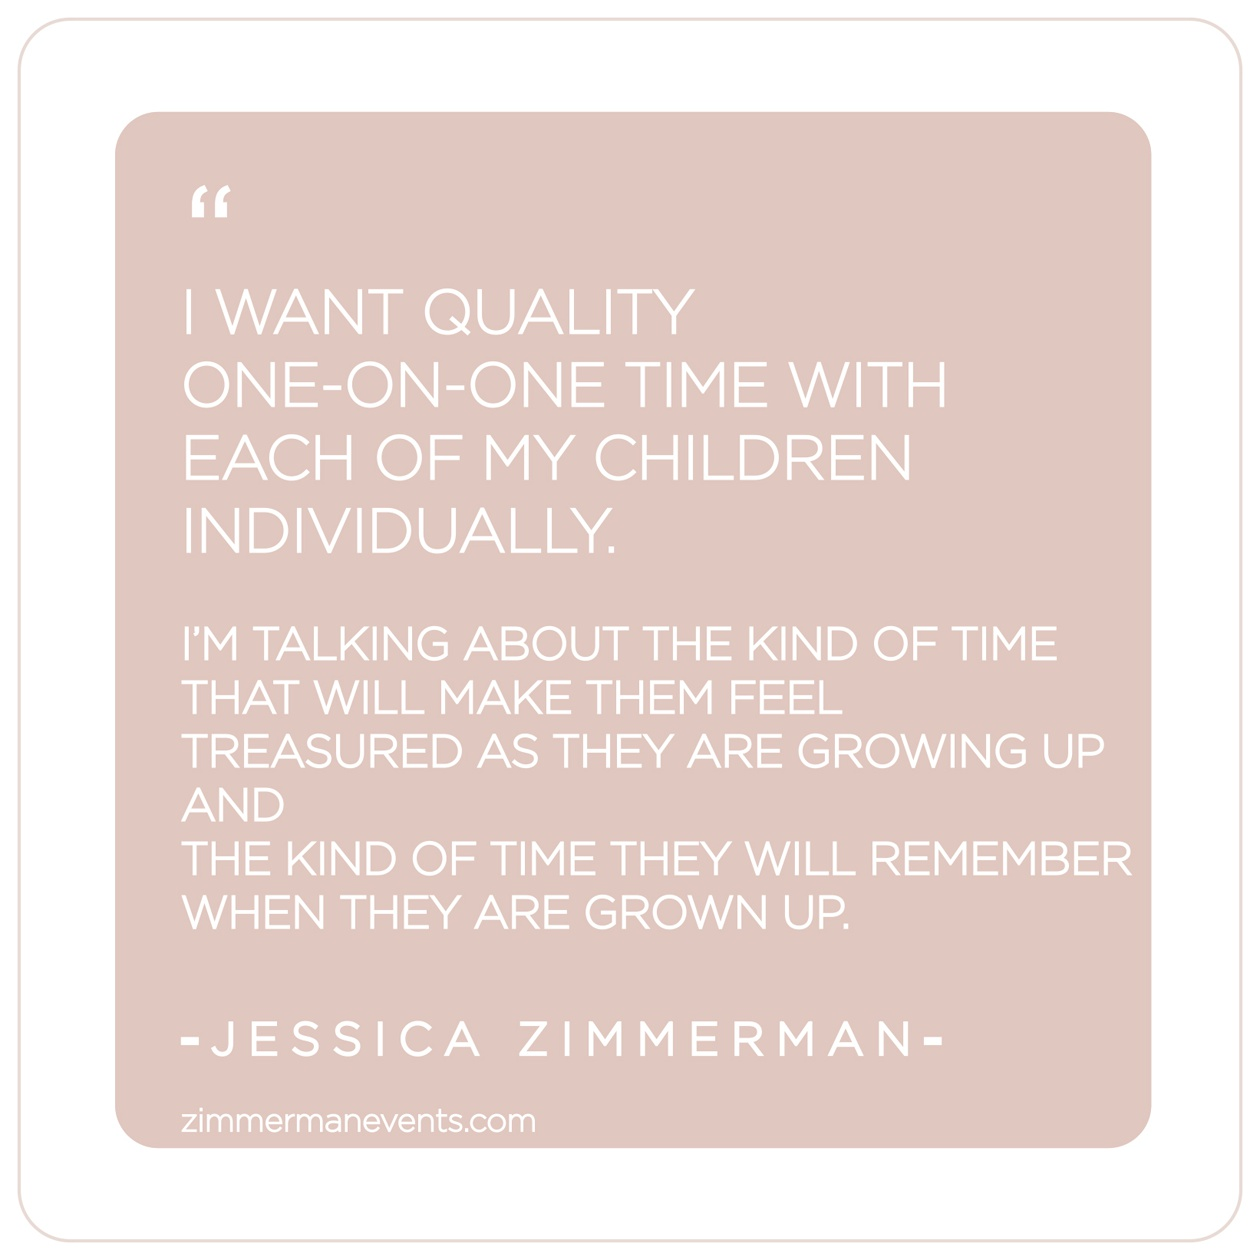 jessica-zimmerman-events-floral-design-coordination-planning-planner-little-rock-conway-arkansas-southern-florist-wedding-home-work-family-balance-business-mentor-balance-work-family